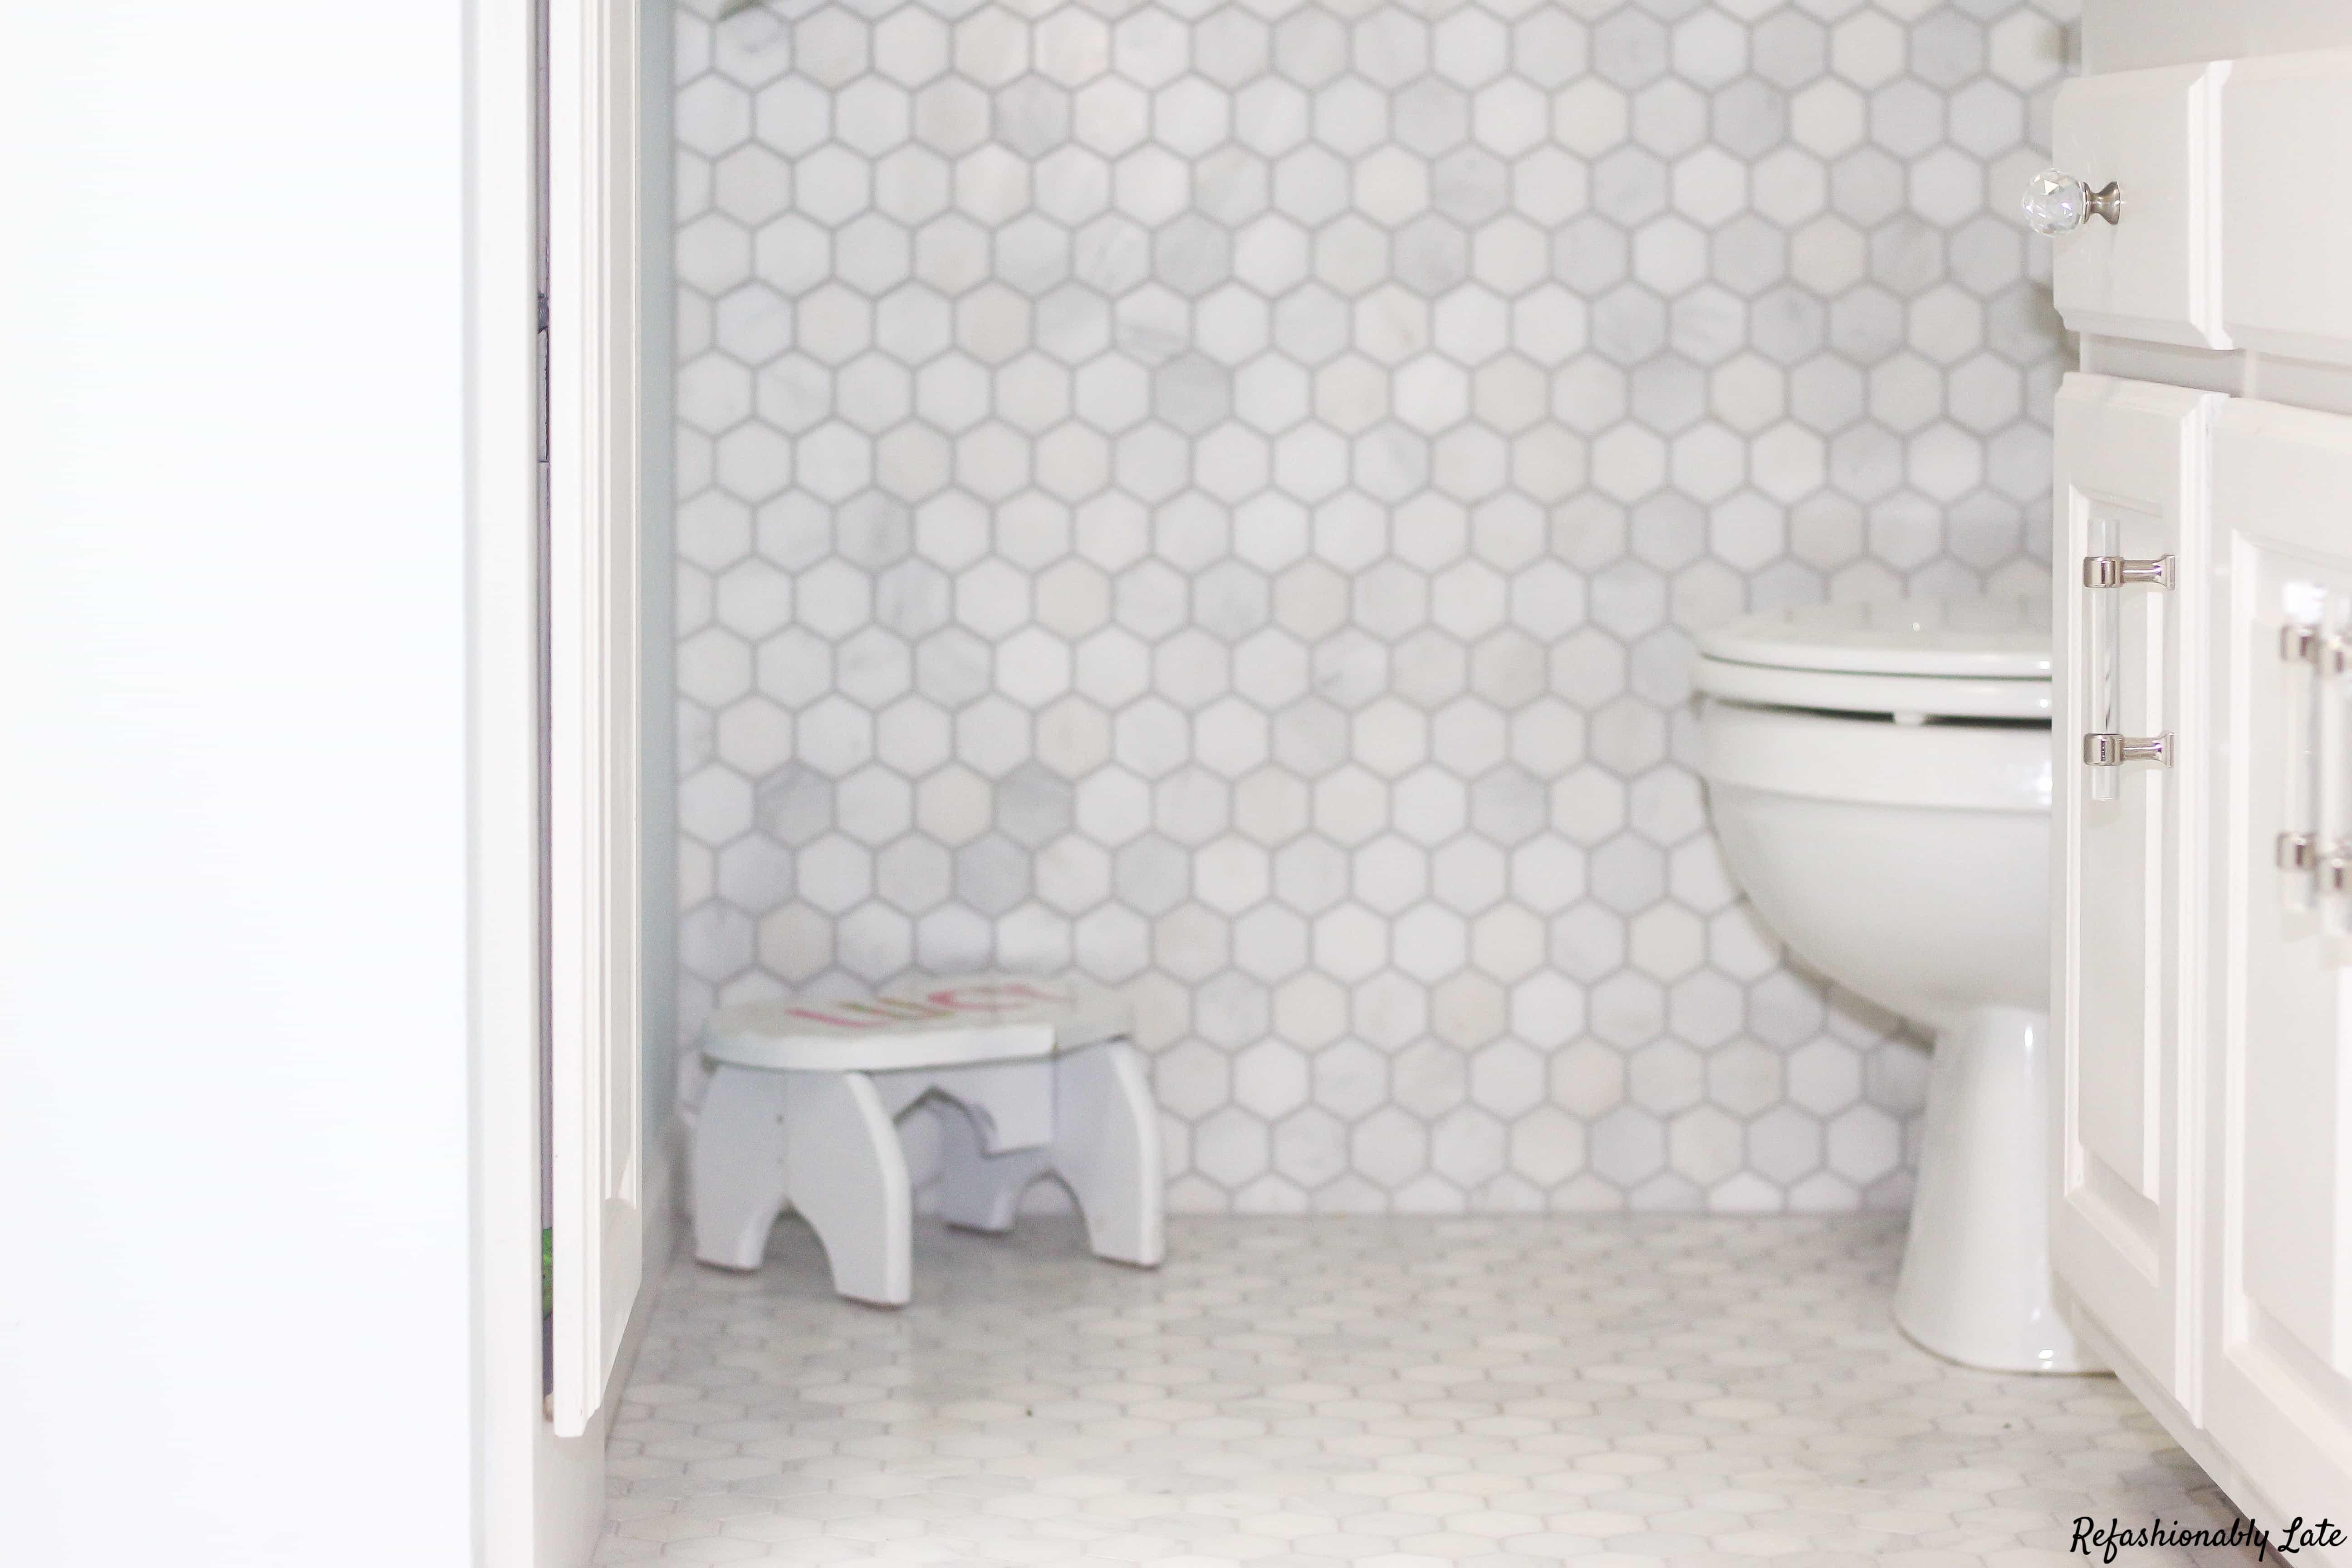 One Room Challenge Bathroom FINAL Reveal - www.refashionablylate.com